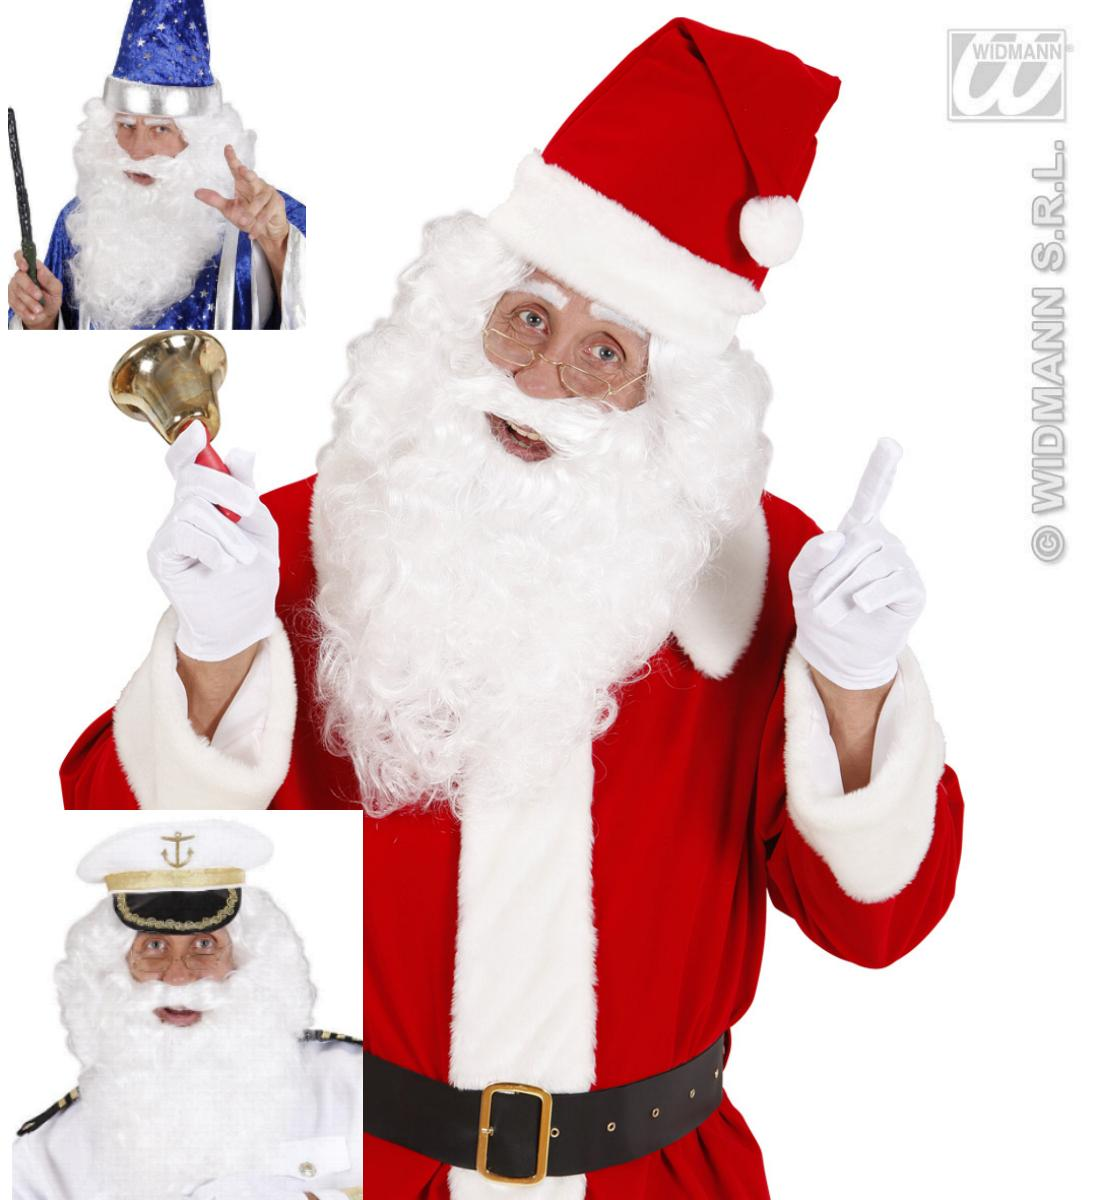 Weihnachtsperücke, Bart u. Oberlippenbart Zauberer, Kapitän Perücke